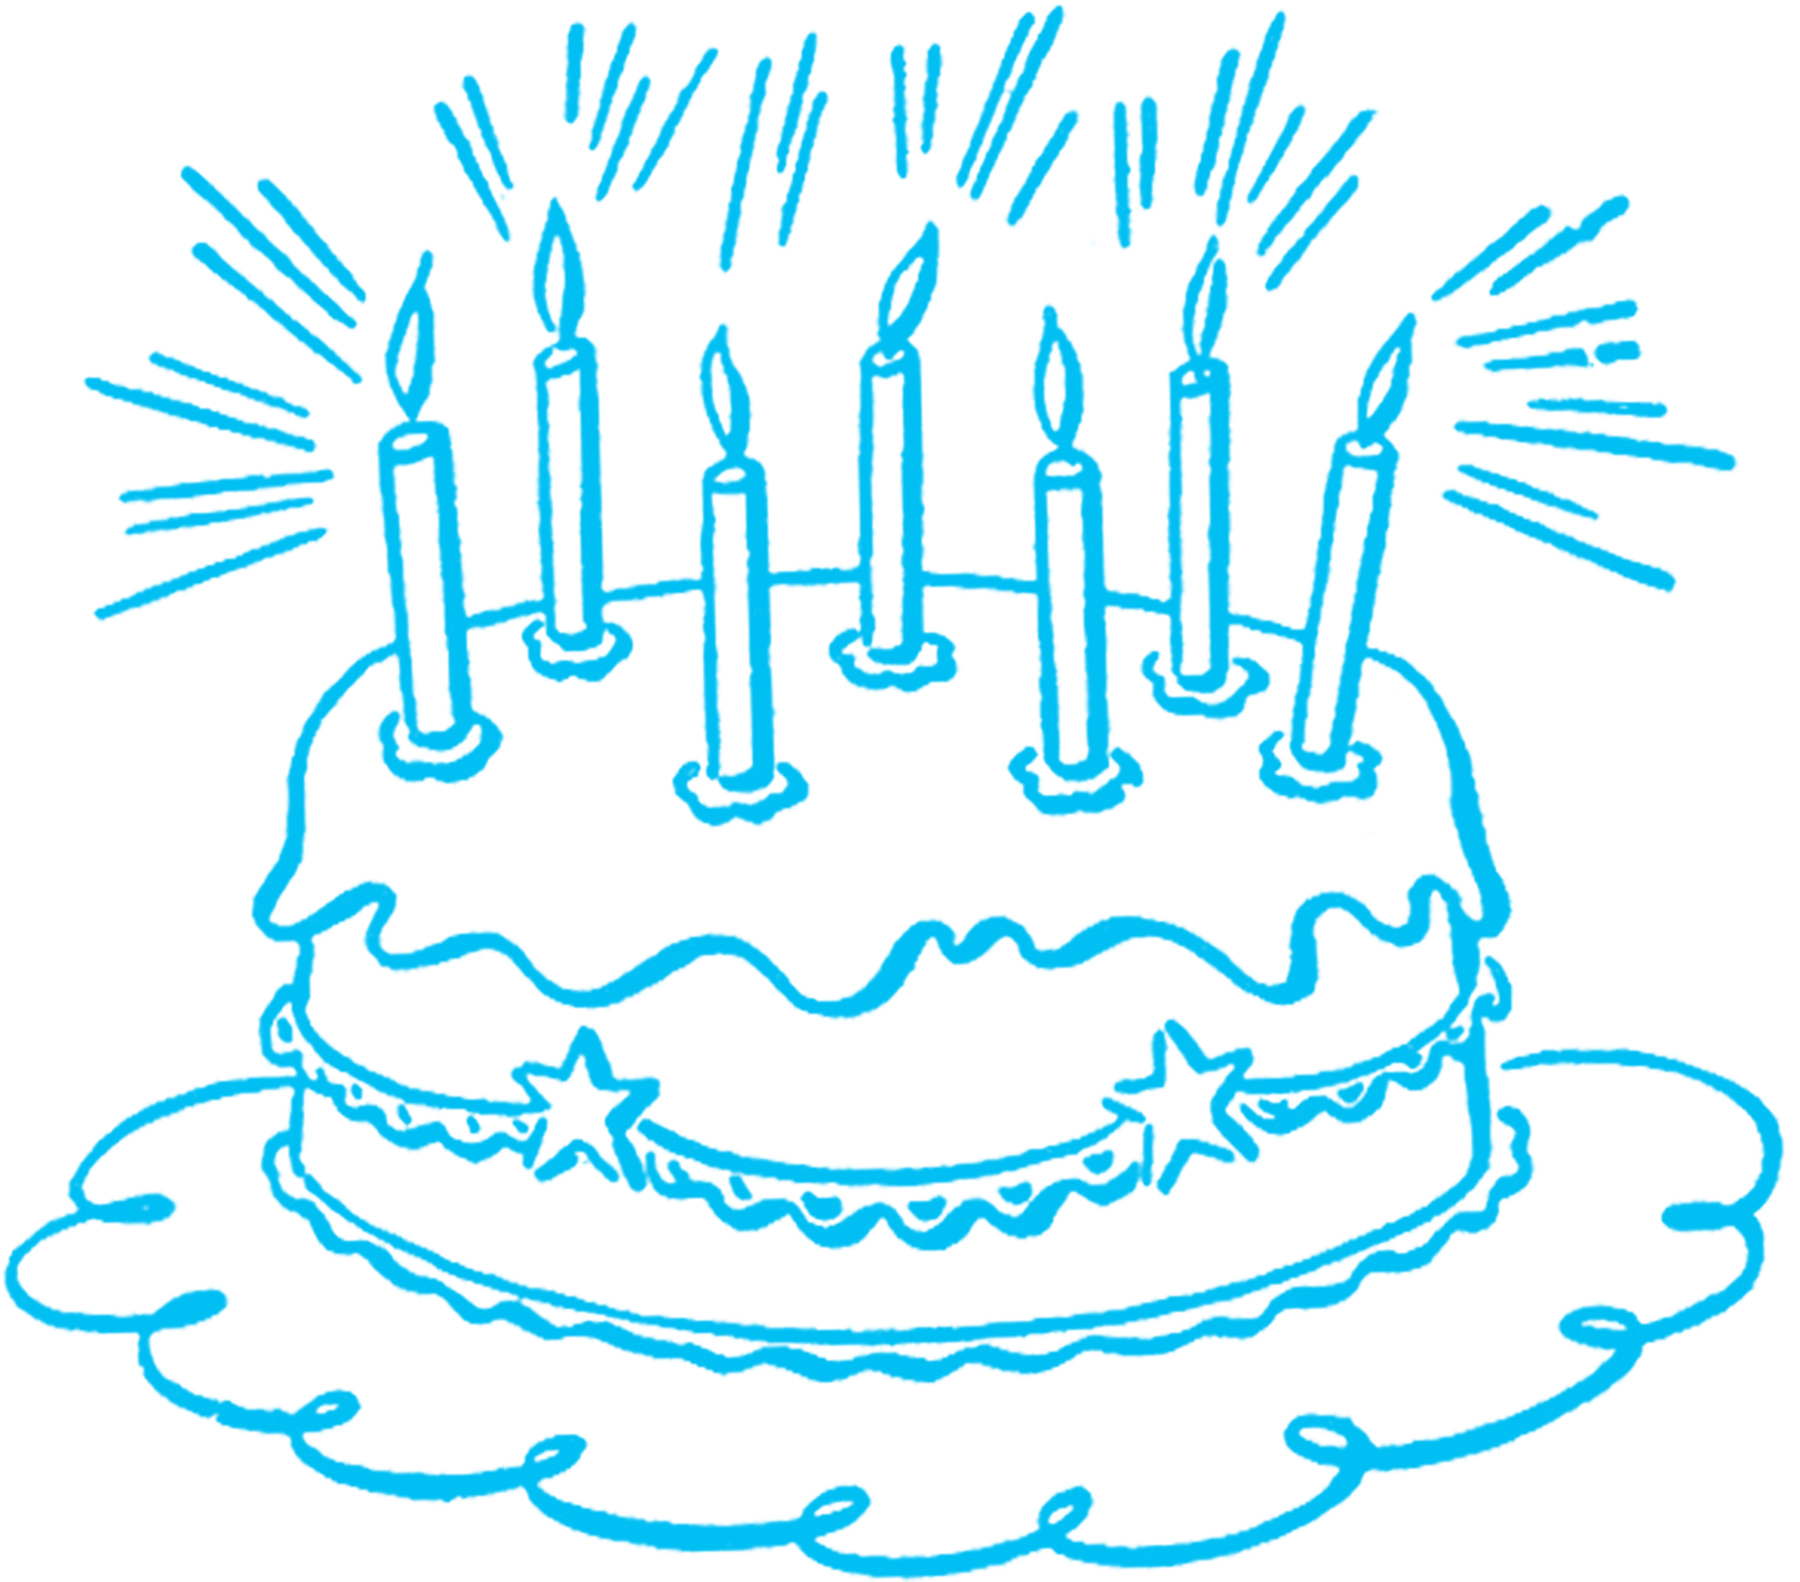 Blue clipart birthday cake. Vintage line art the